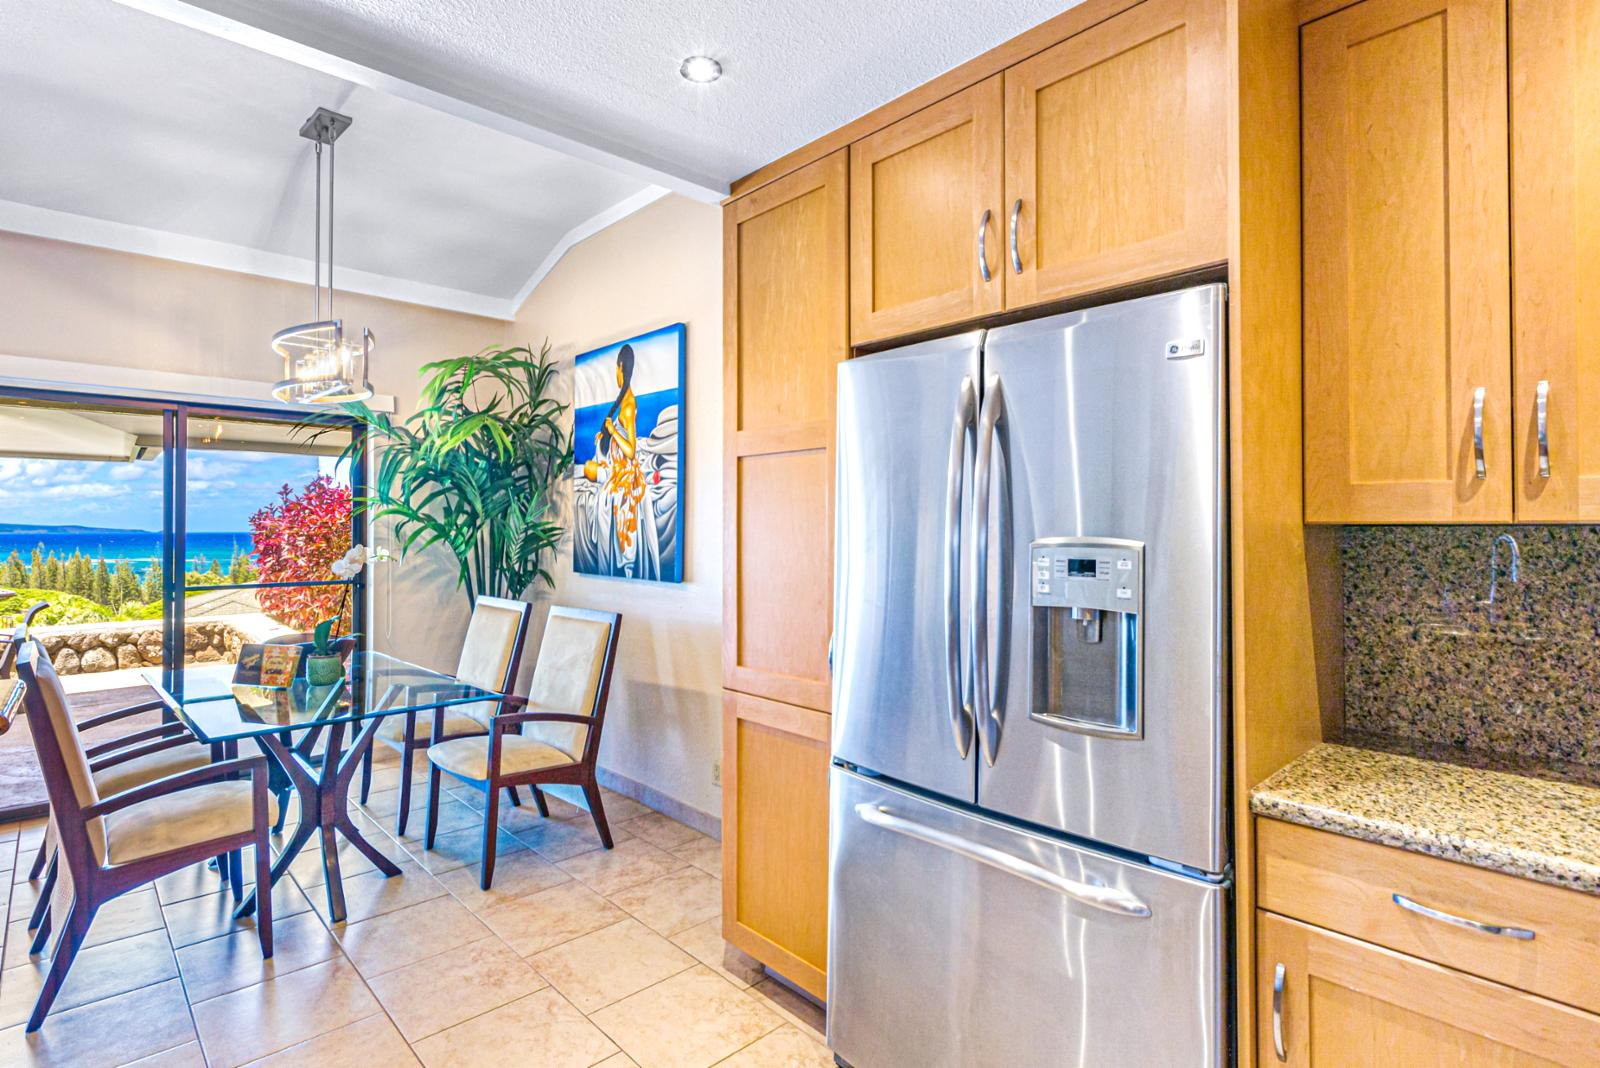 Well stocked kitchen with plenty of storage.